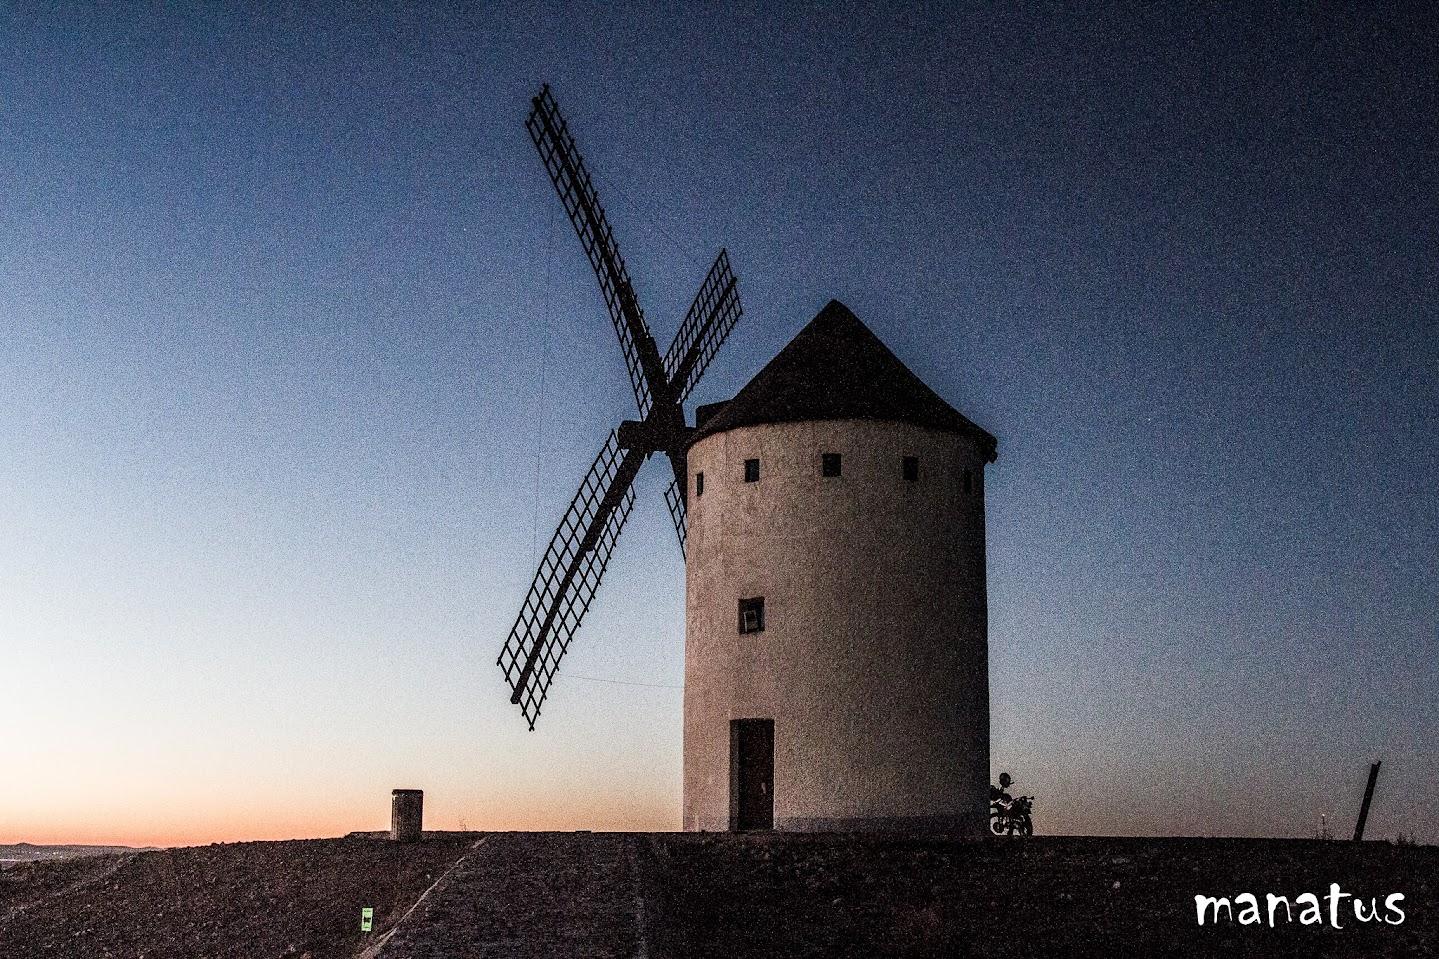 manatus molino de viento